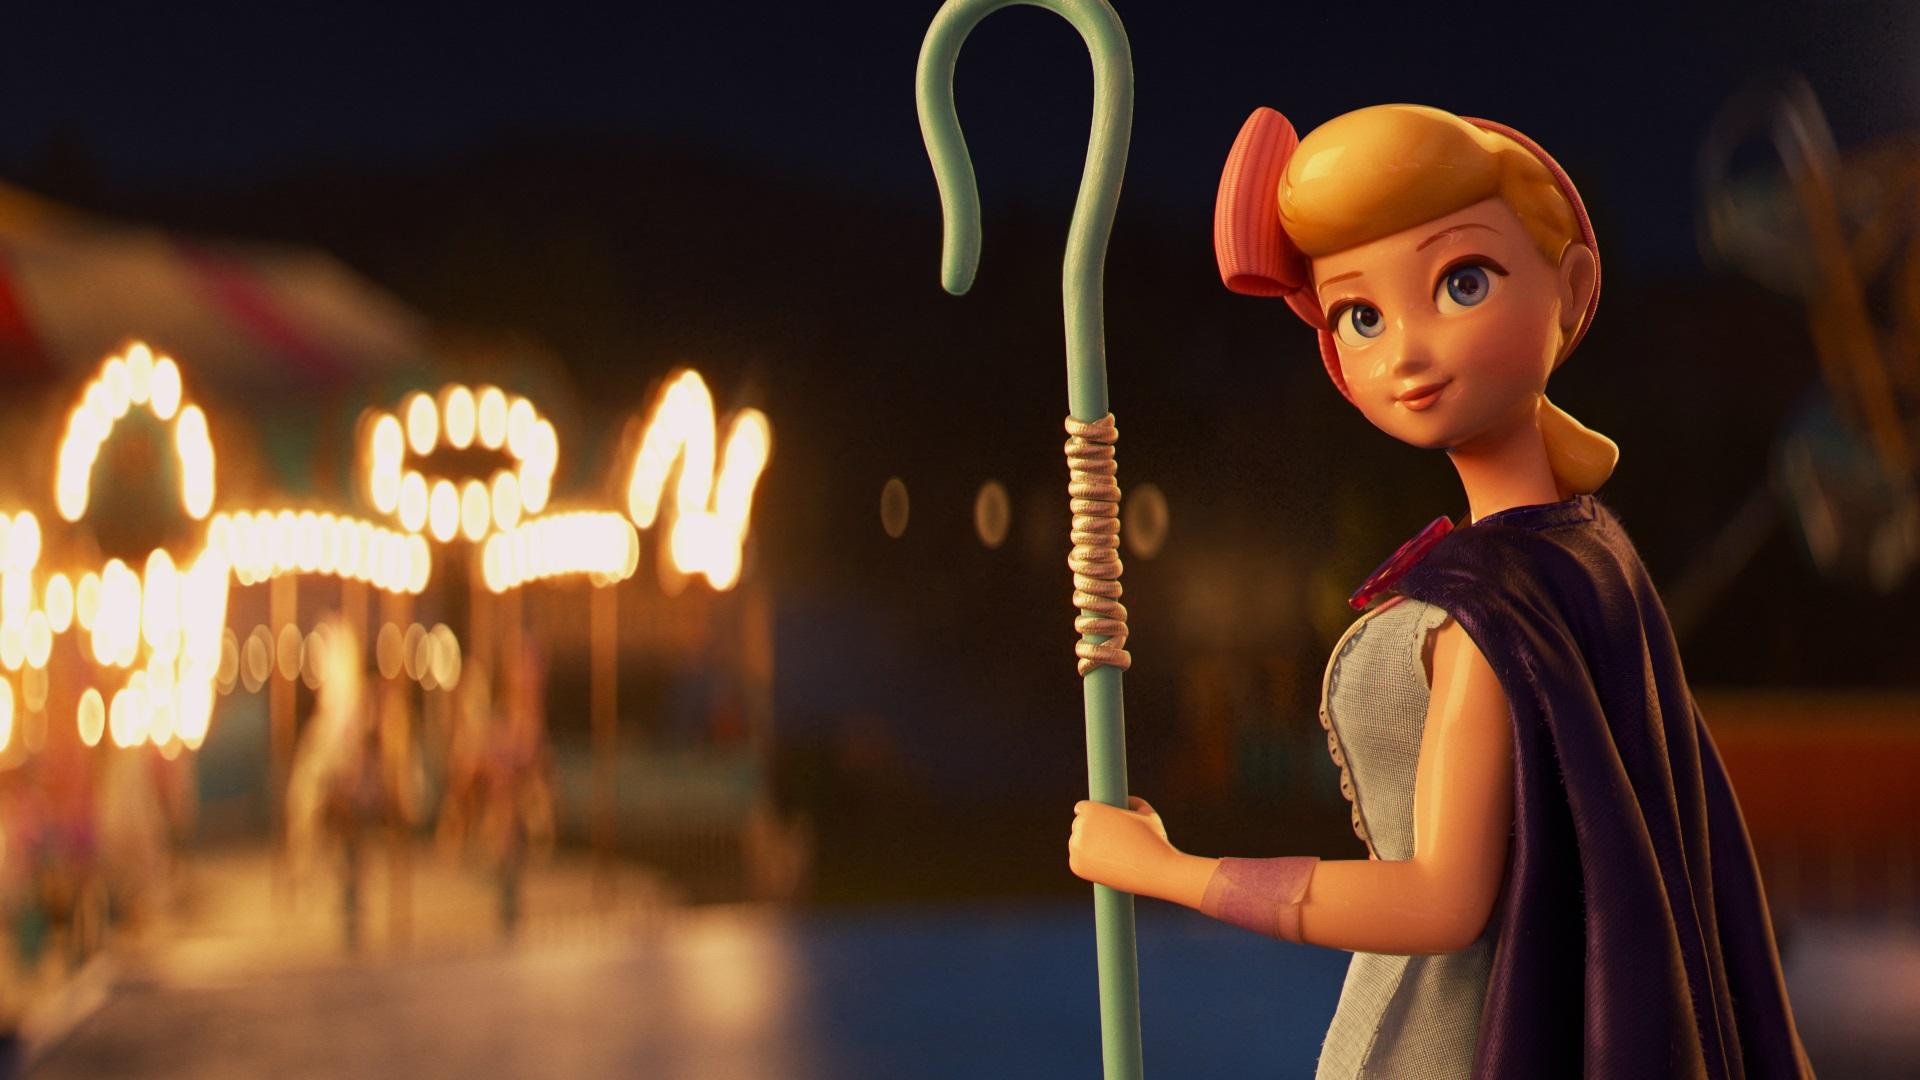 Bo Peep in Toy Story 4 (2019)